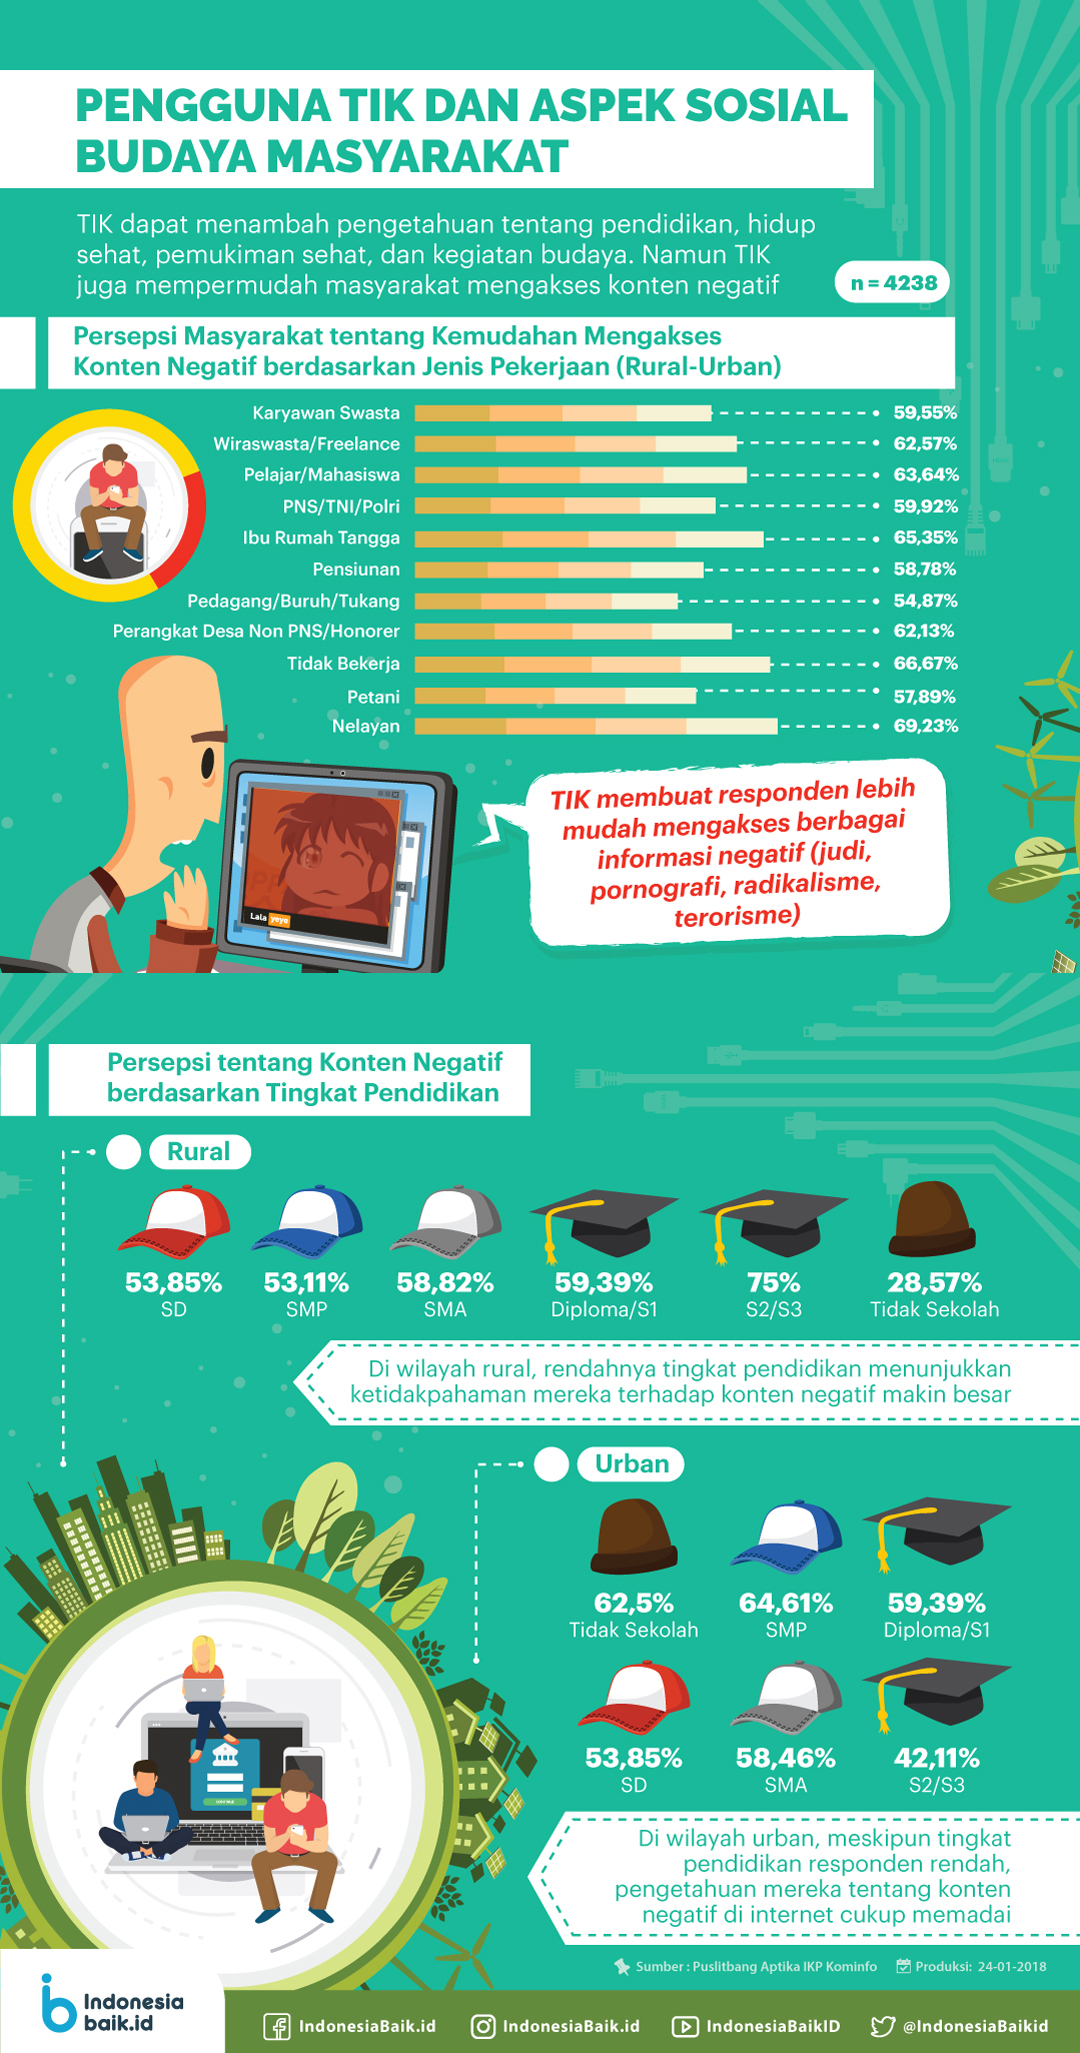 Pengguna TIK dan Aspek Sosial Budaya Masyarakat #22